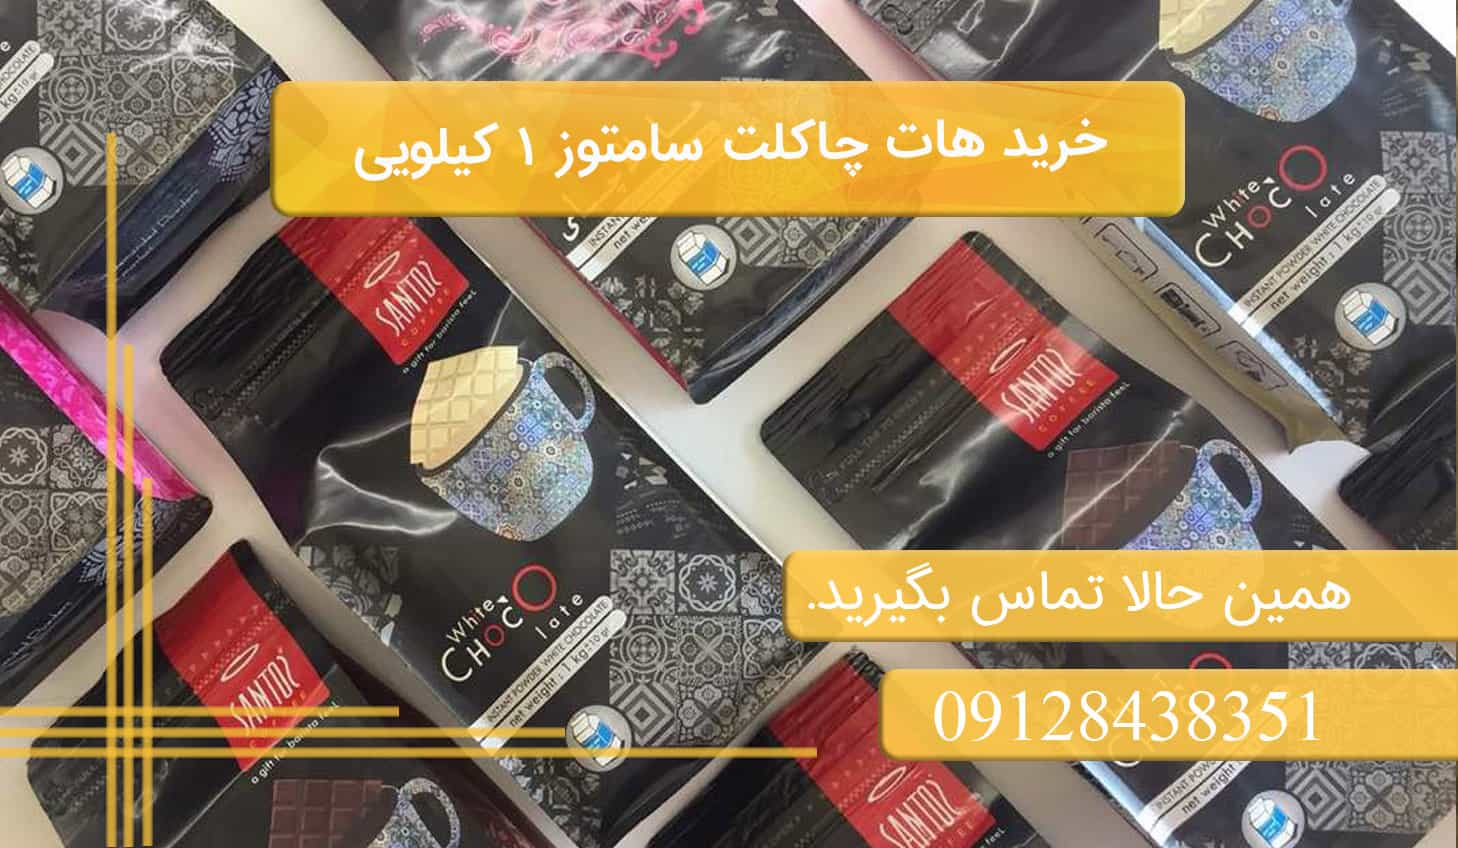 خرید هات چاکلت سامتوز 1 کیلویی-min